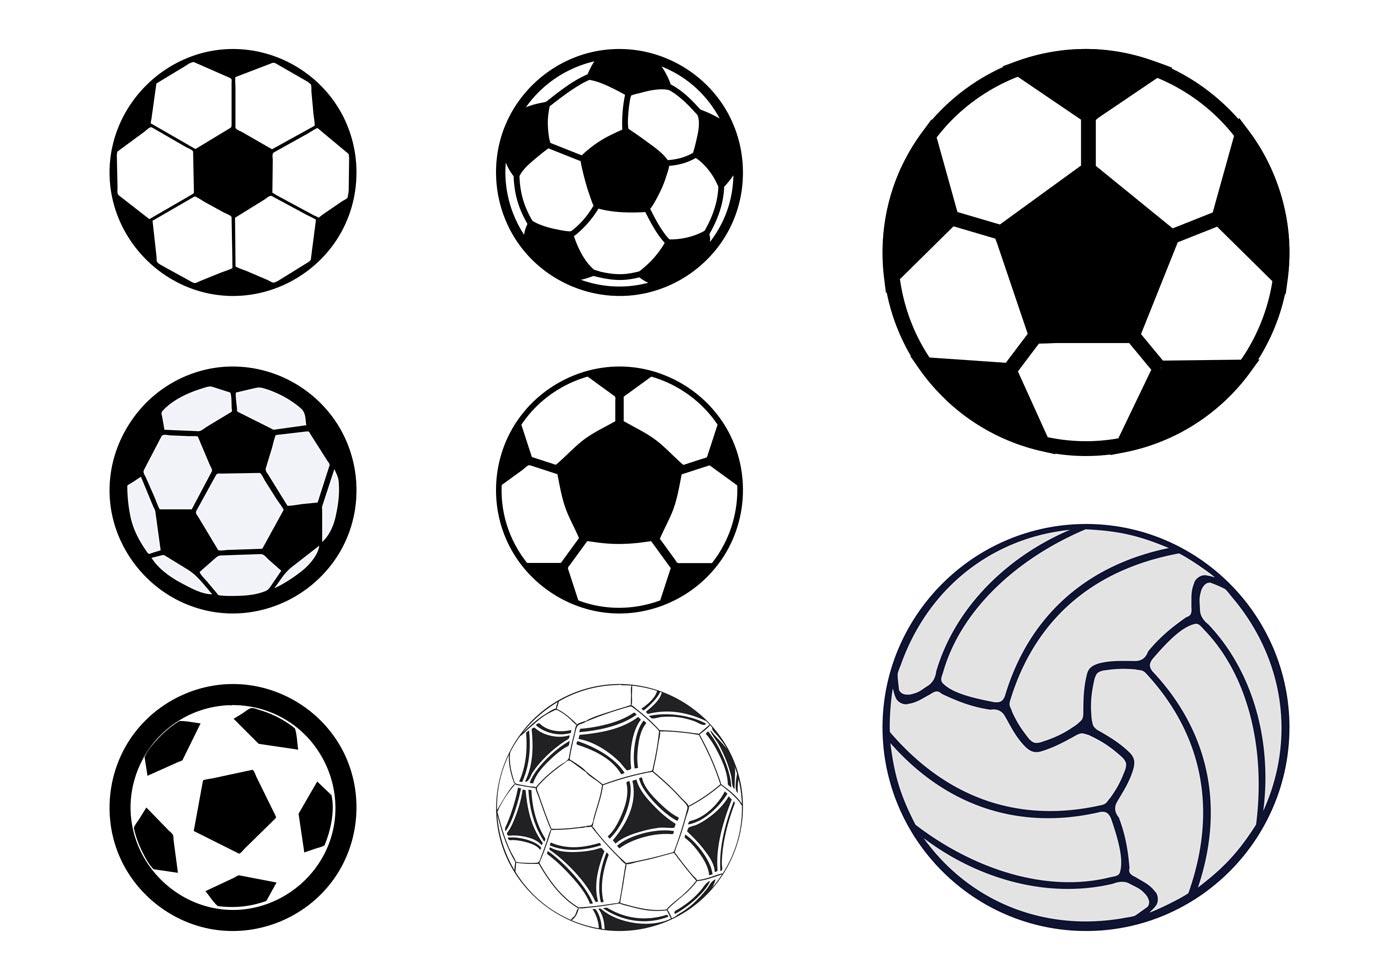 balls sports vector ball soccer clipart icons clip vectors stylized graphics games freevector footballs football bola